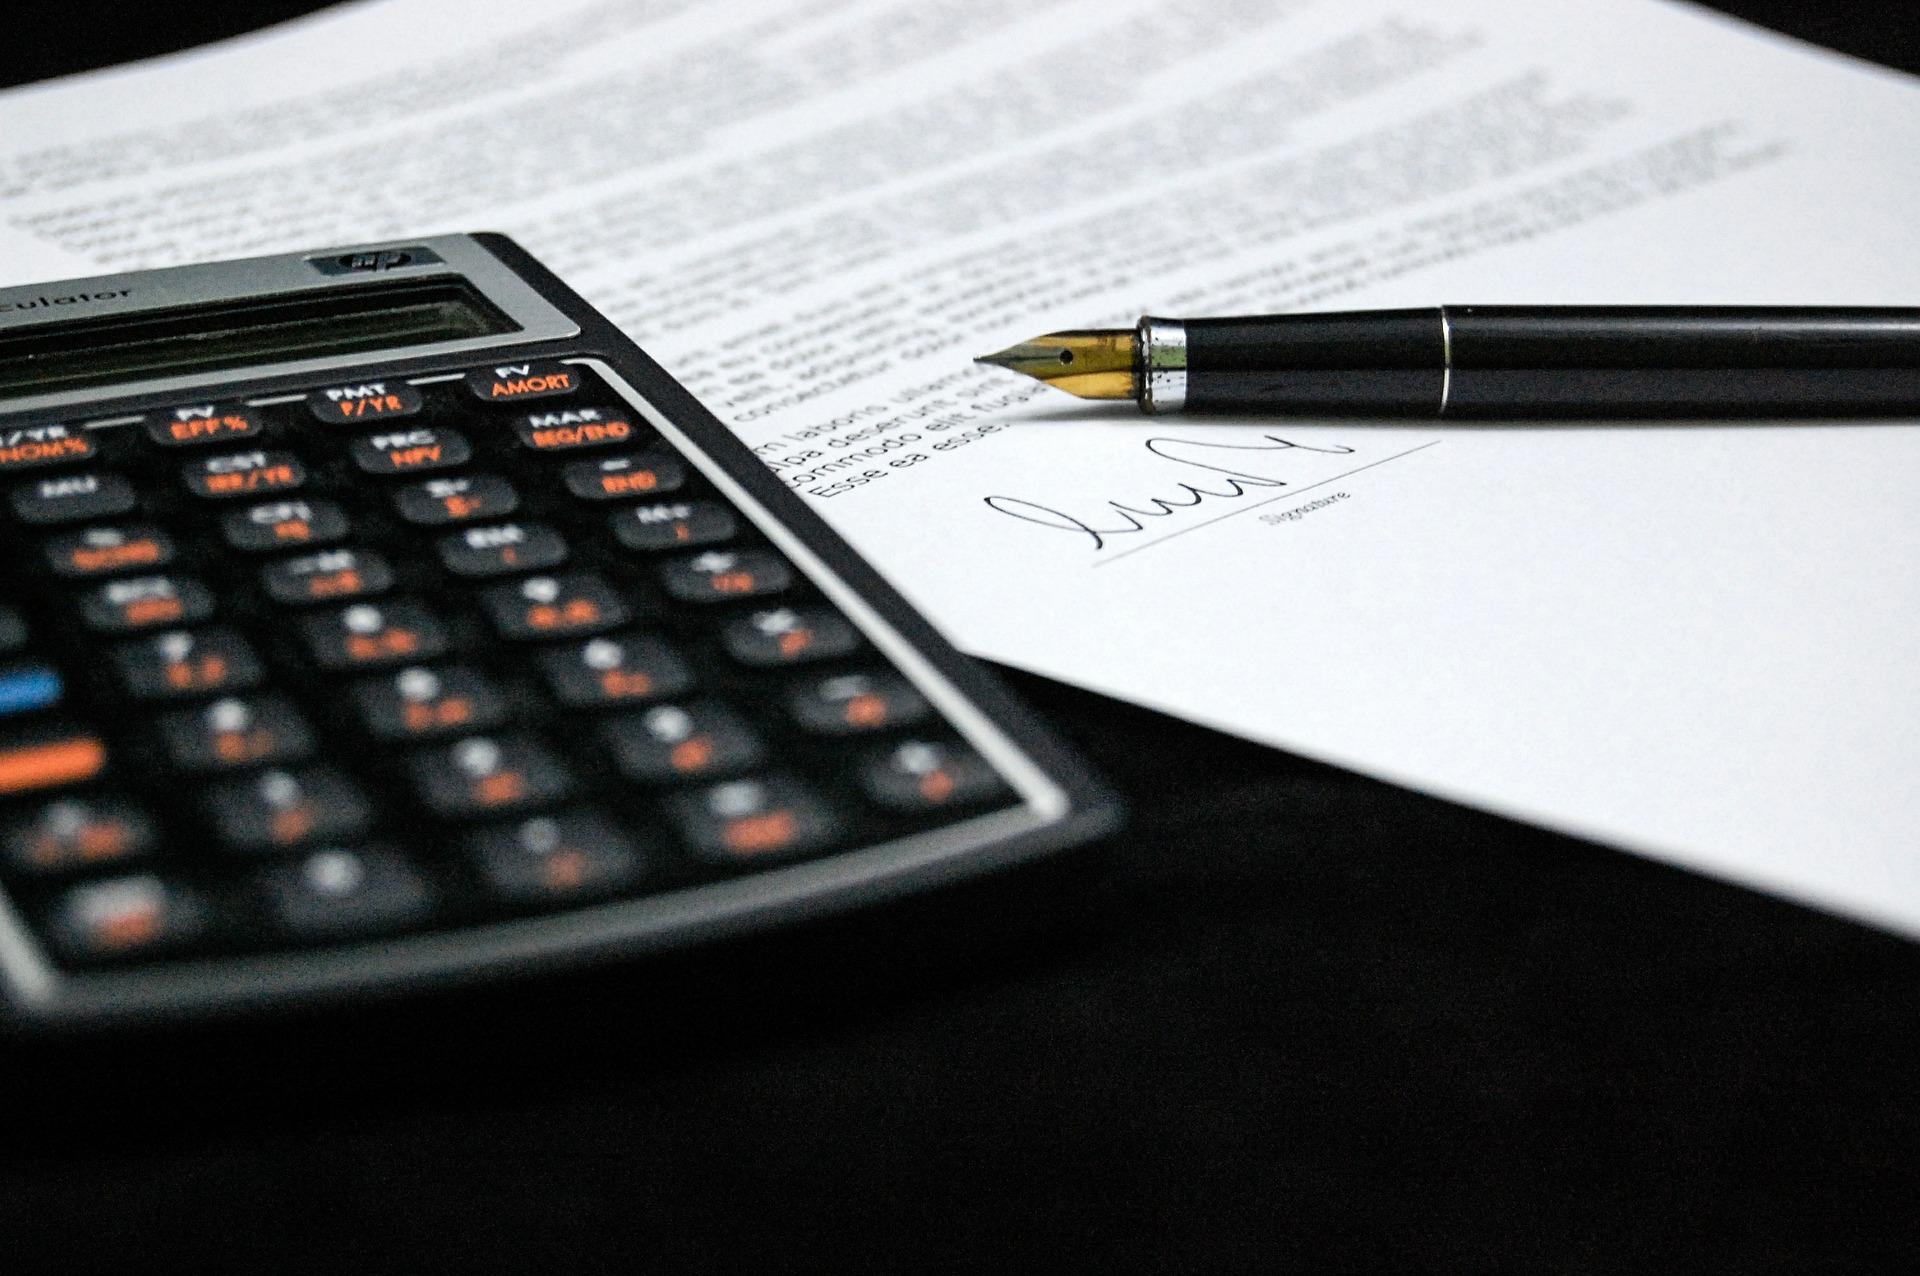 dokument kalkulacka pero smlouva